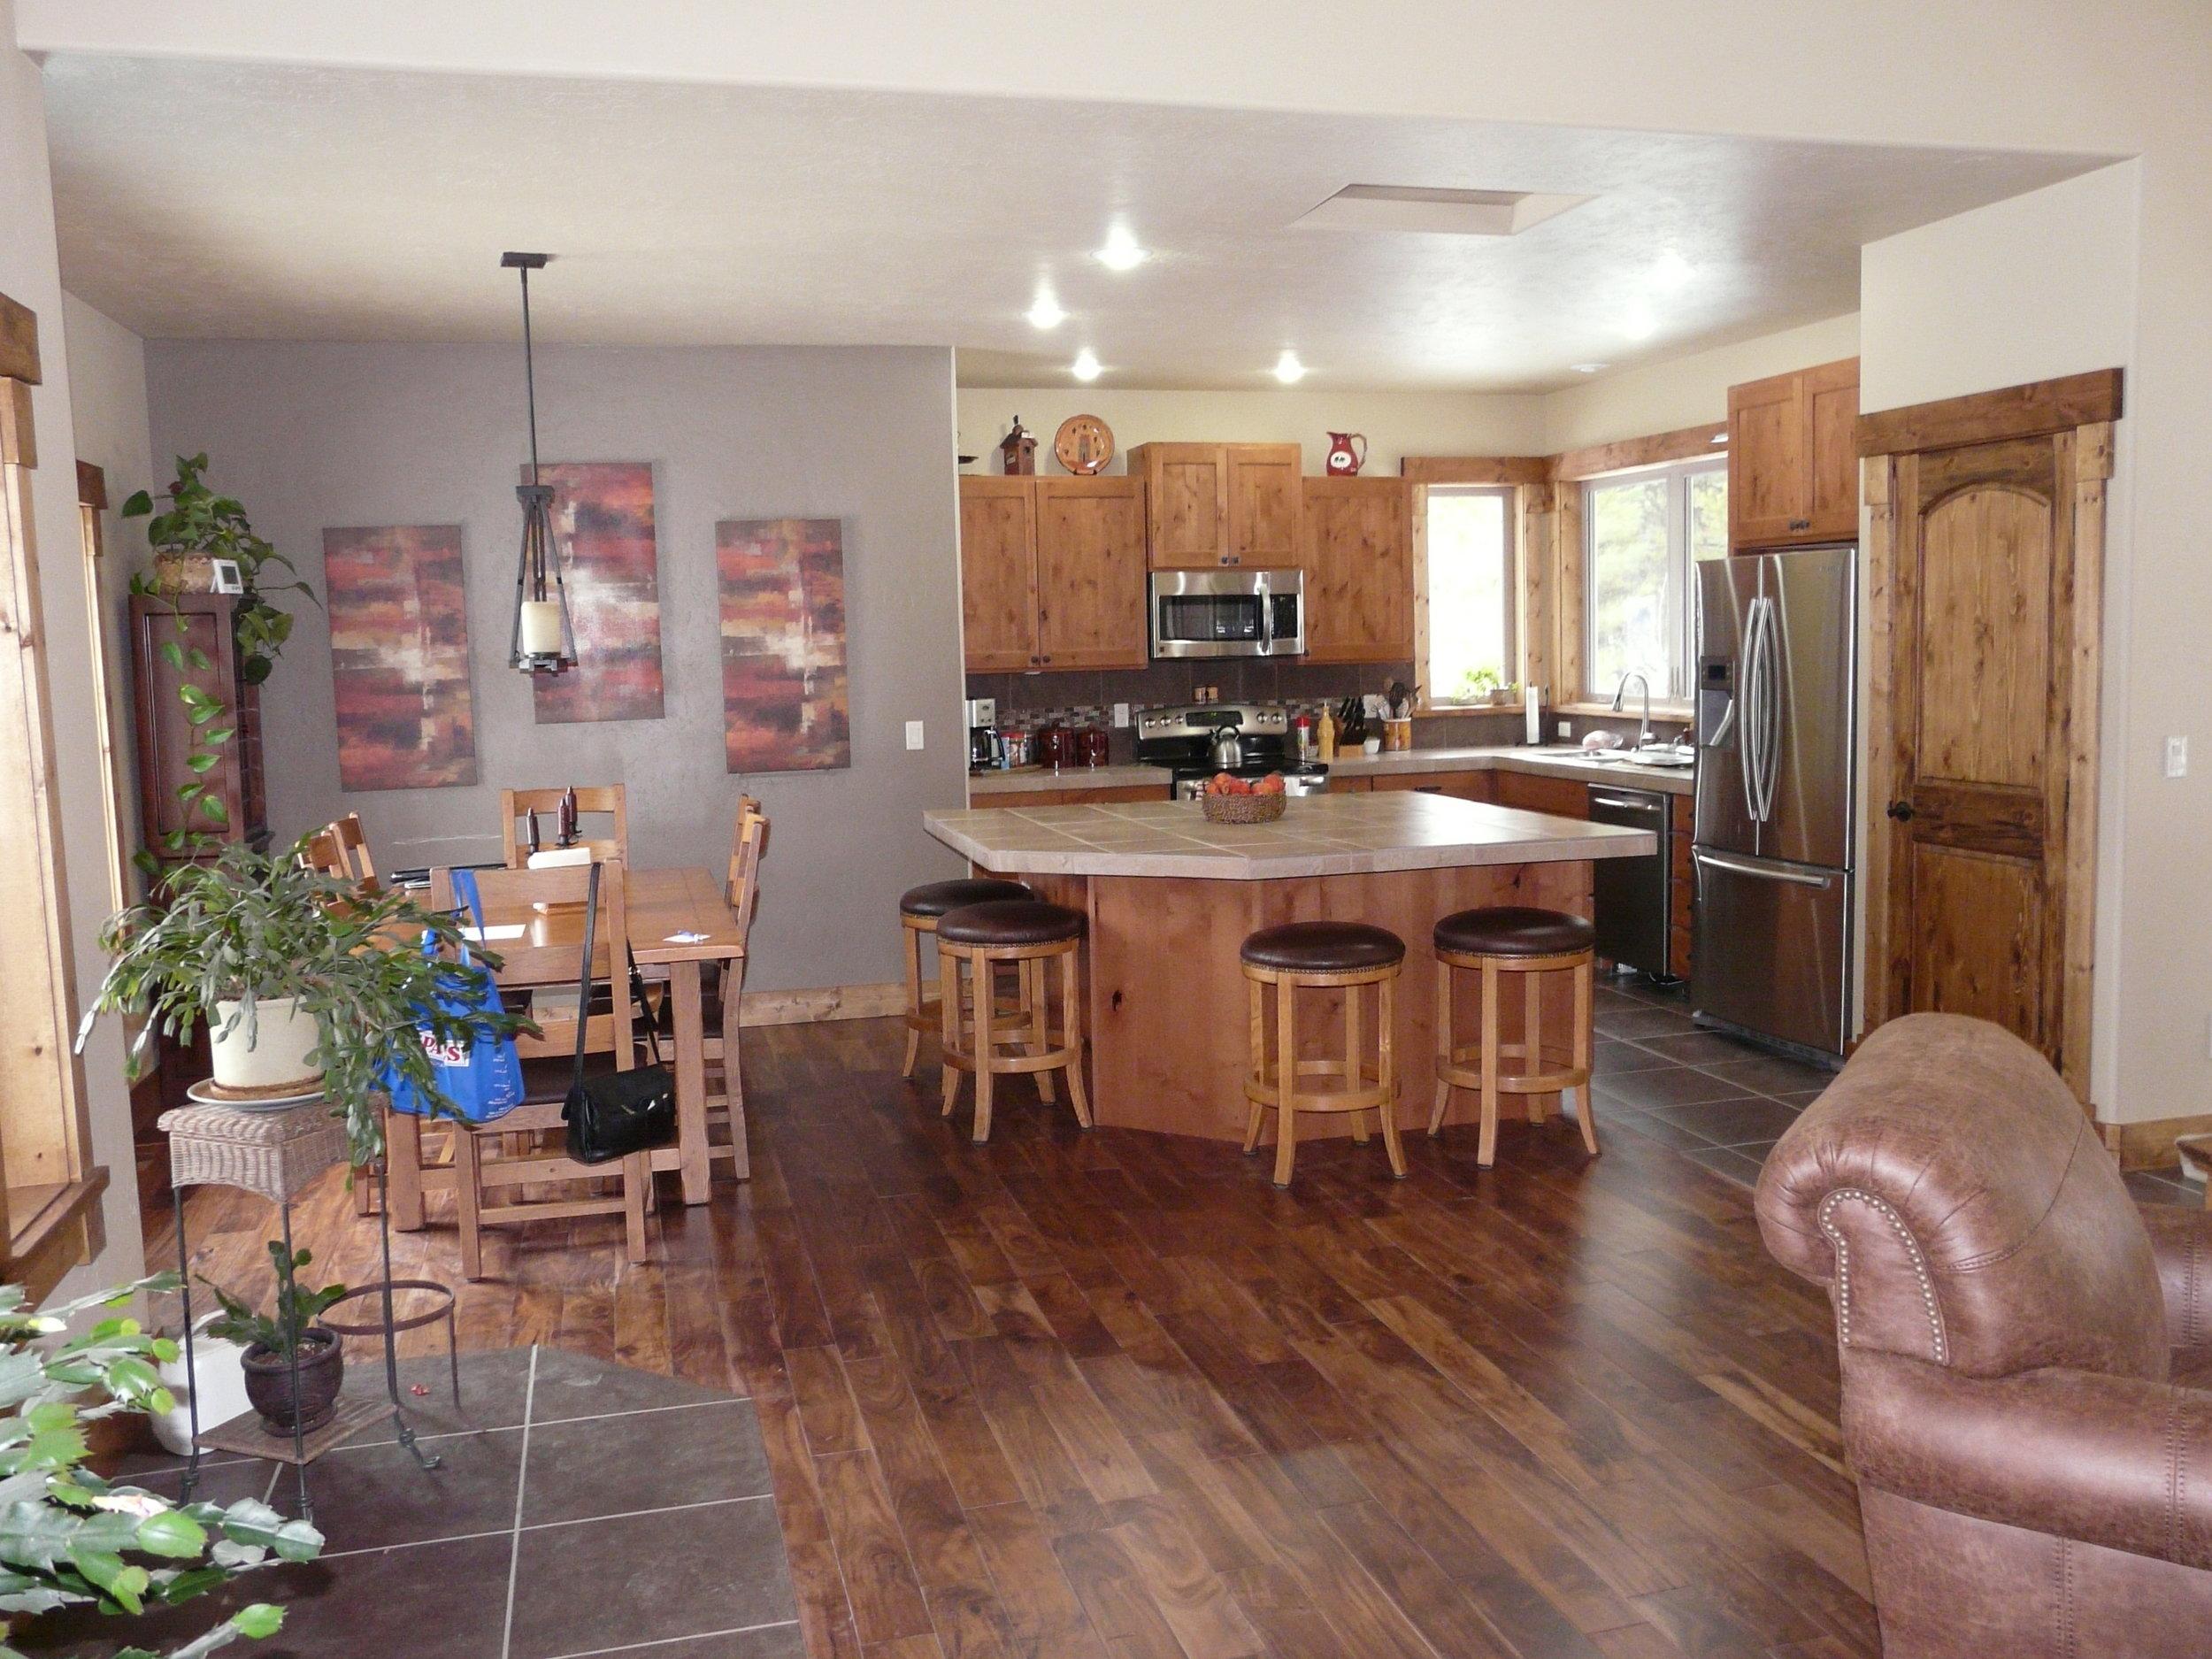 Hideaway kitchen.JPG